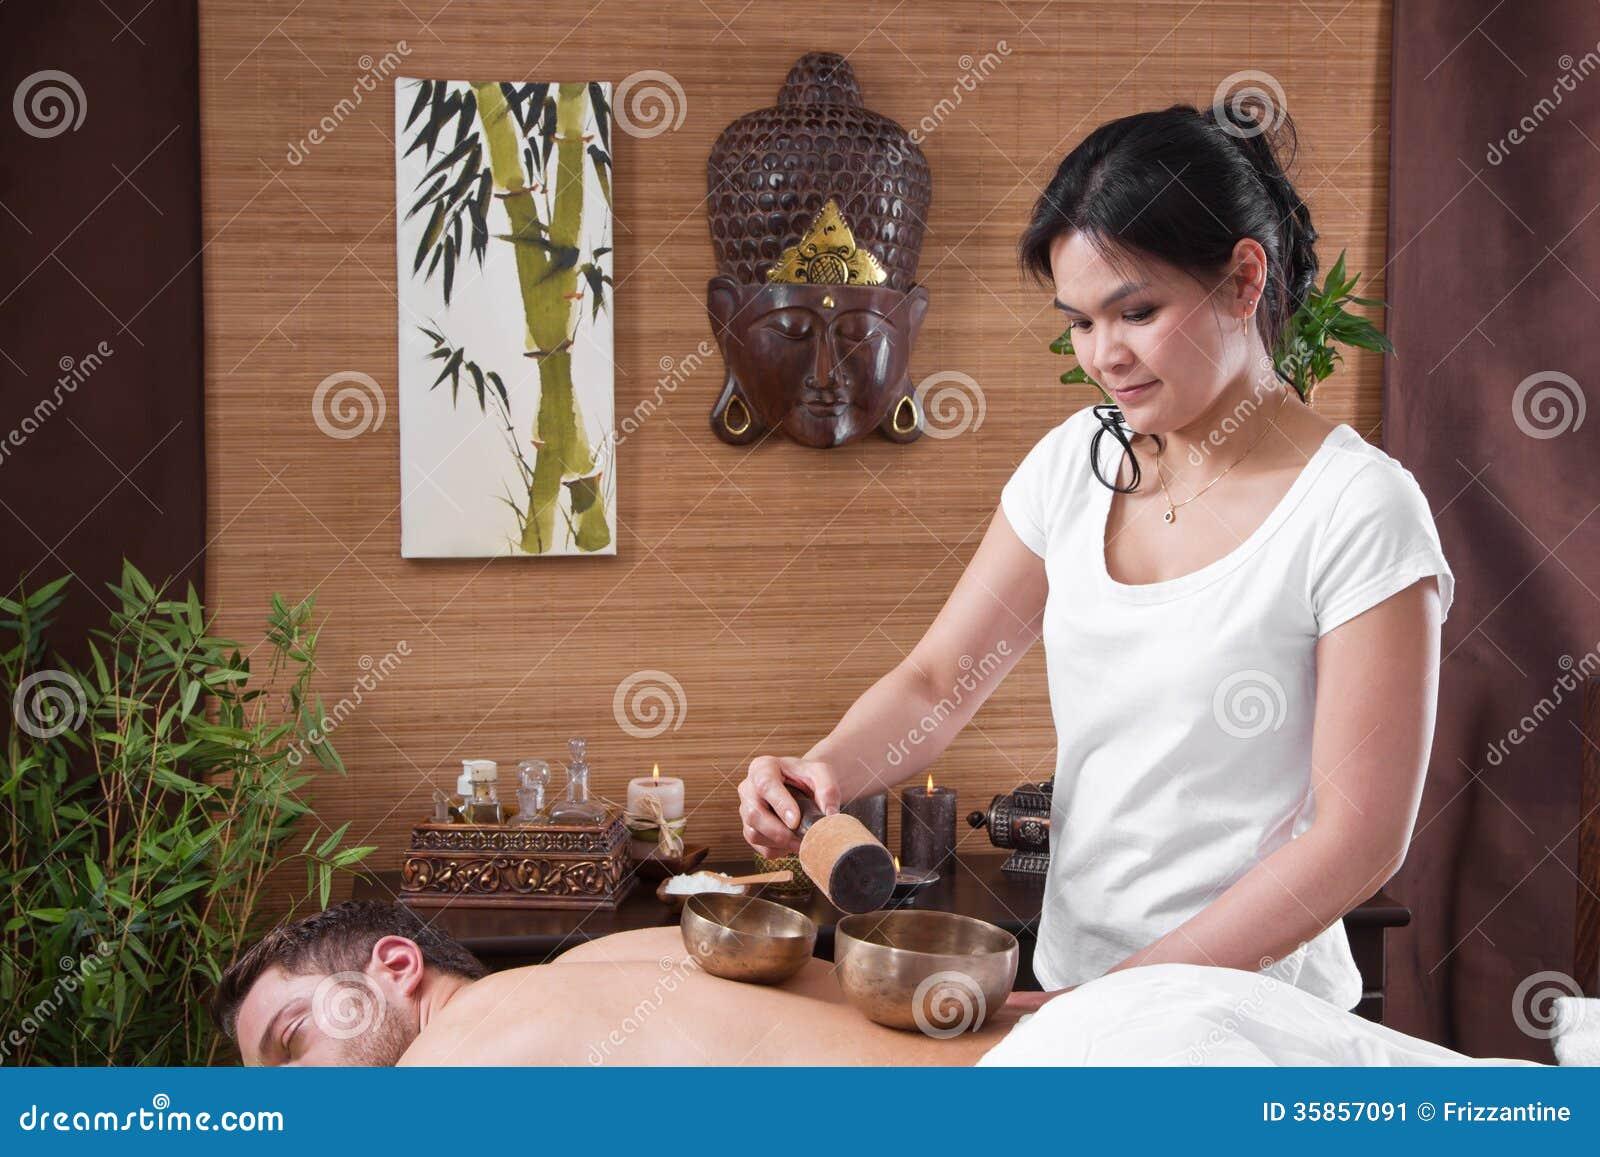 Japanese Man Massages Girl 'young japanese girls massage'